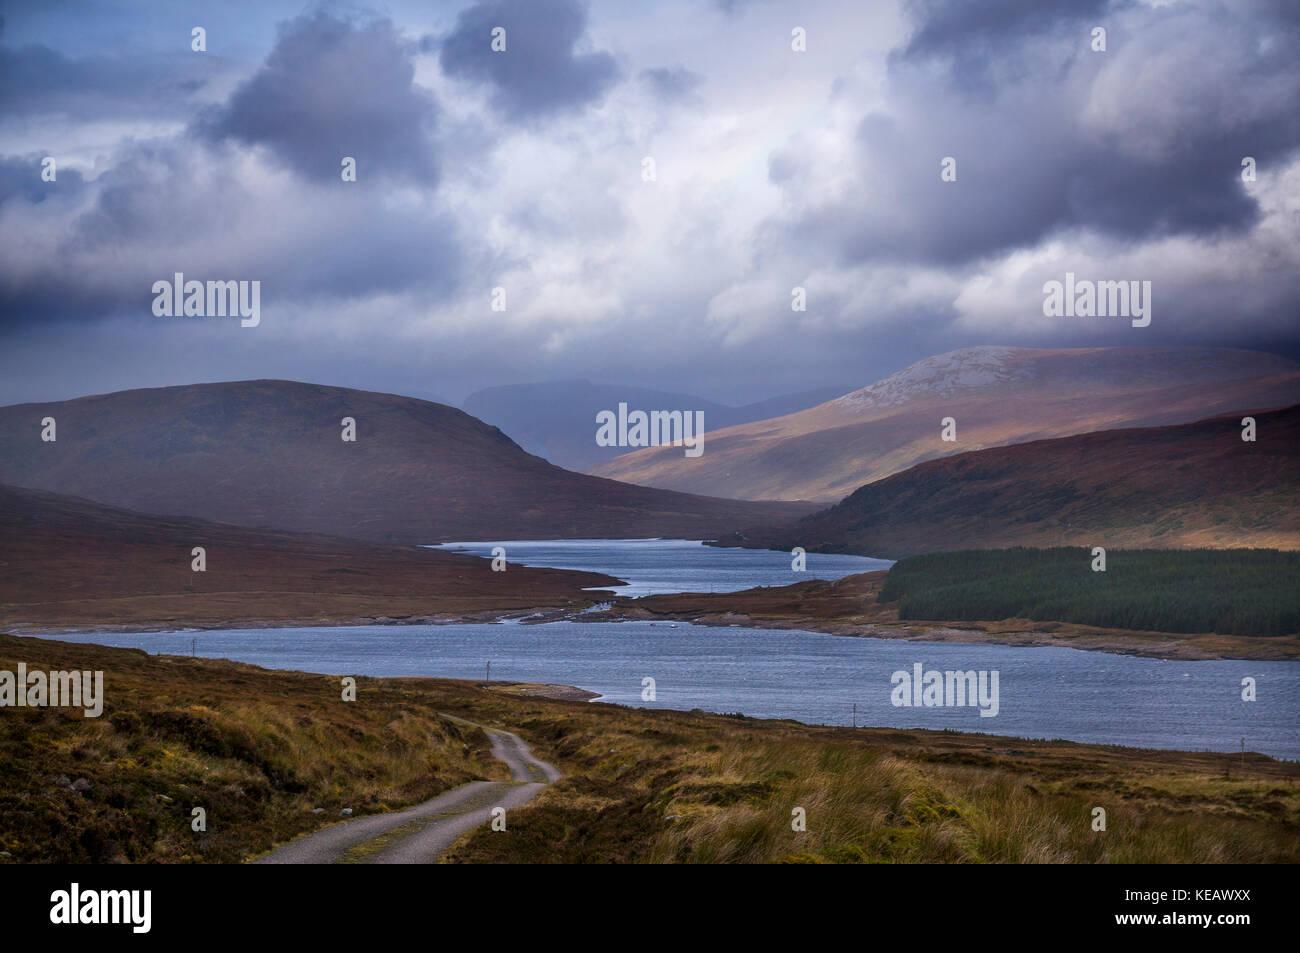 Loch Shin in Sutherland, Scottish Highlands, UK - Stock Image